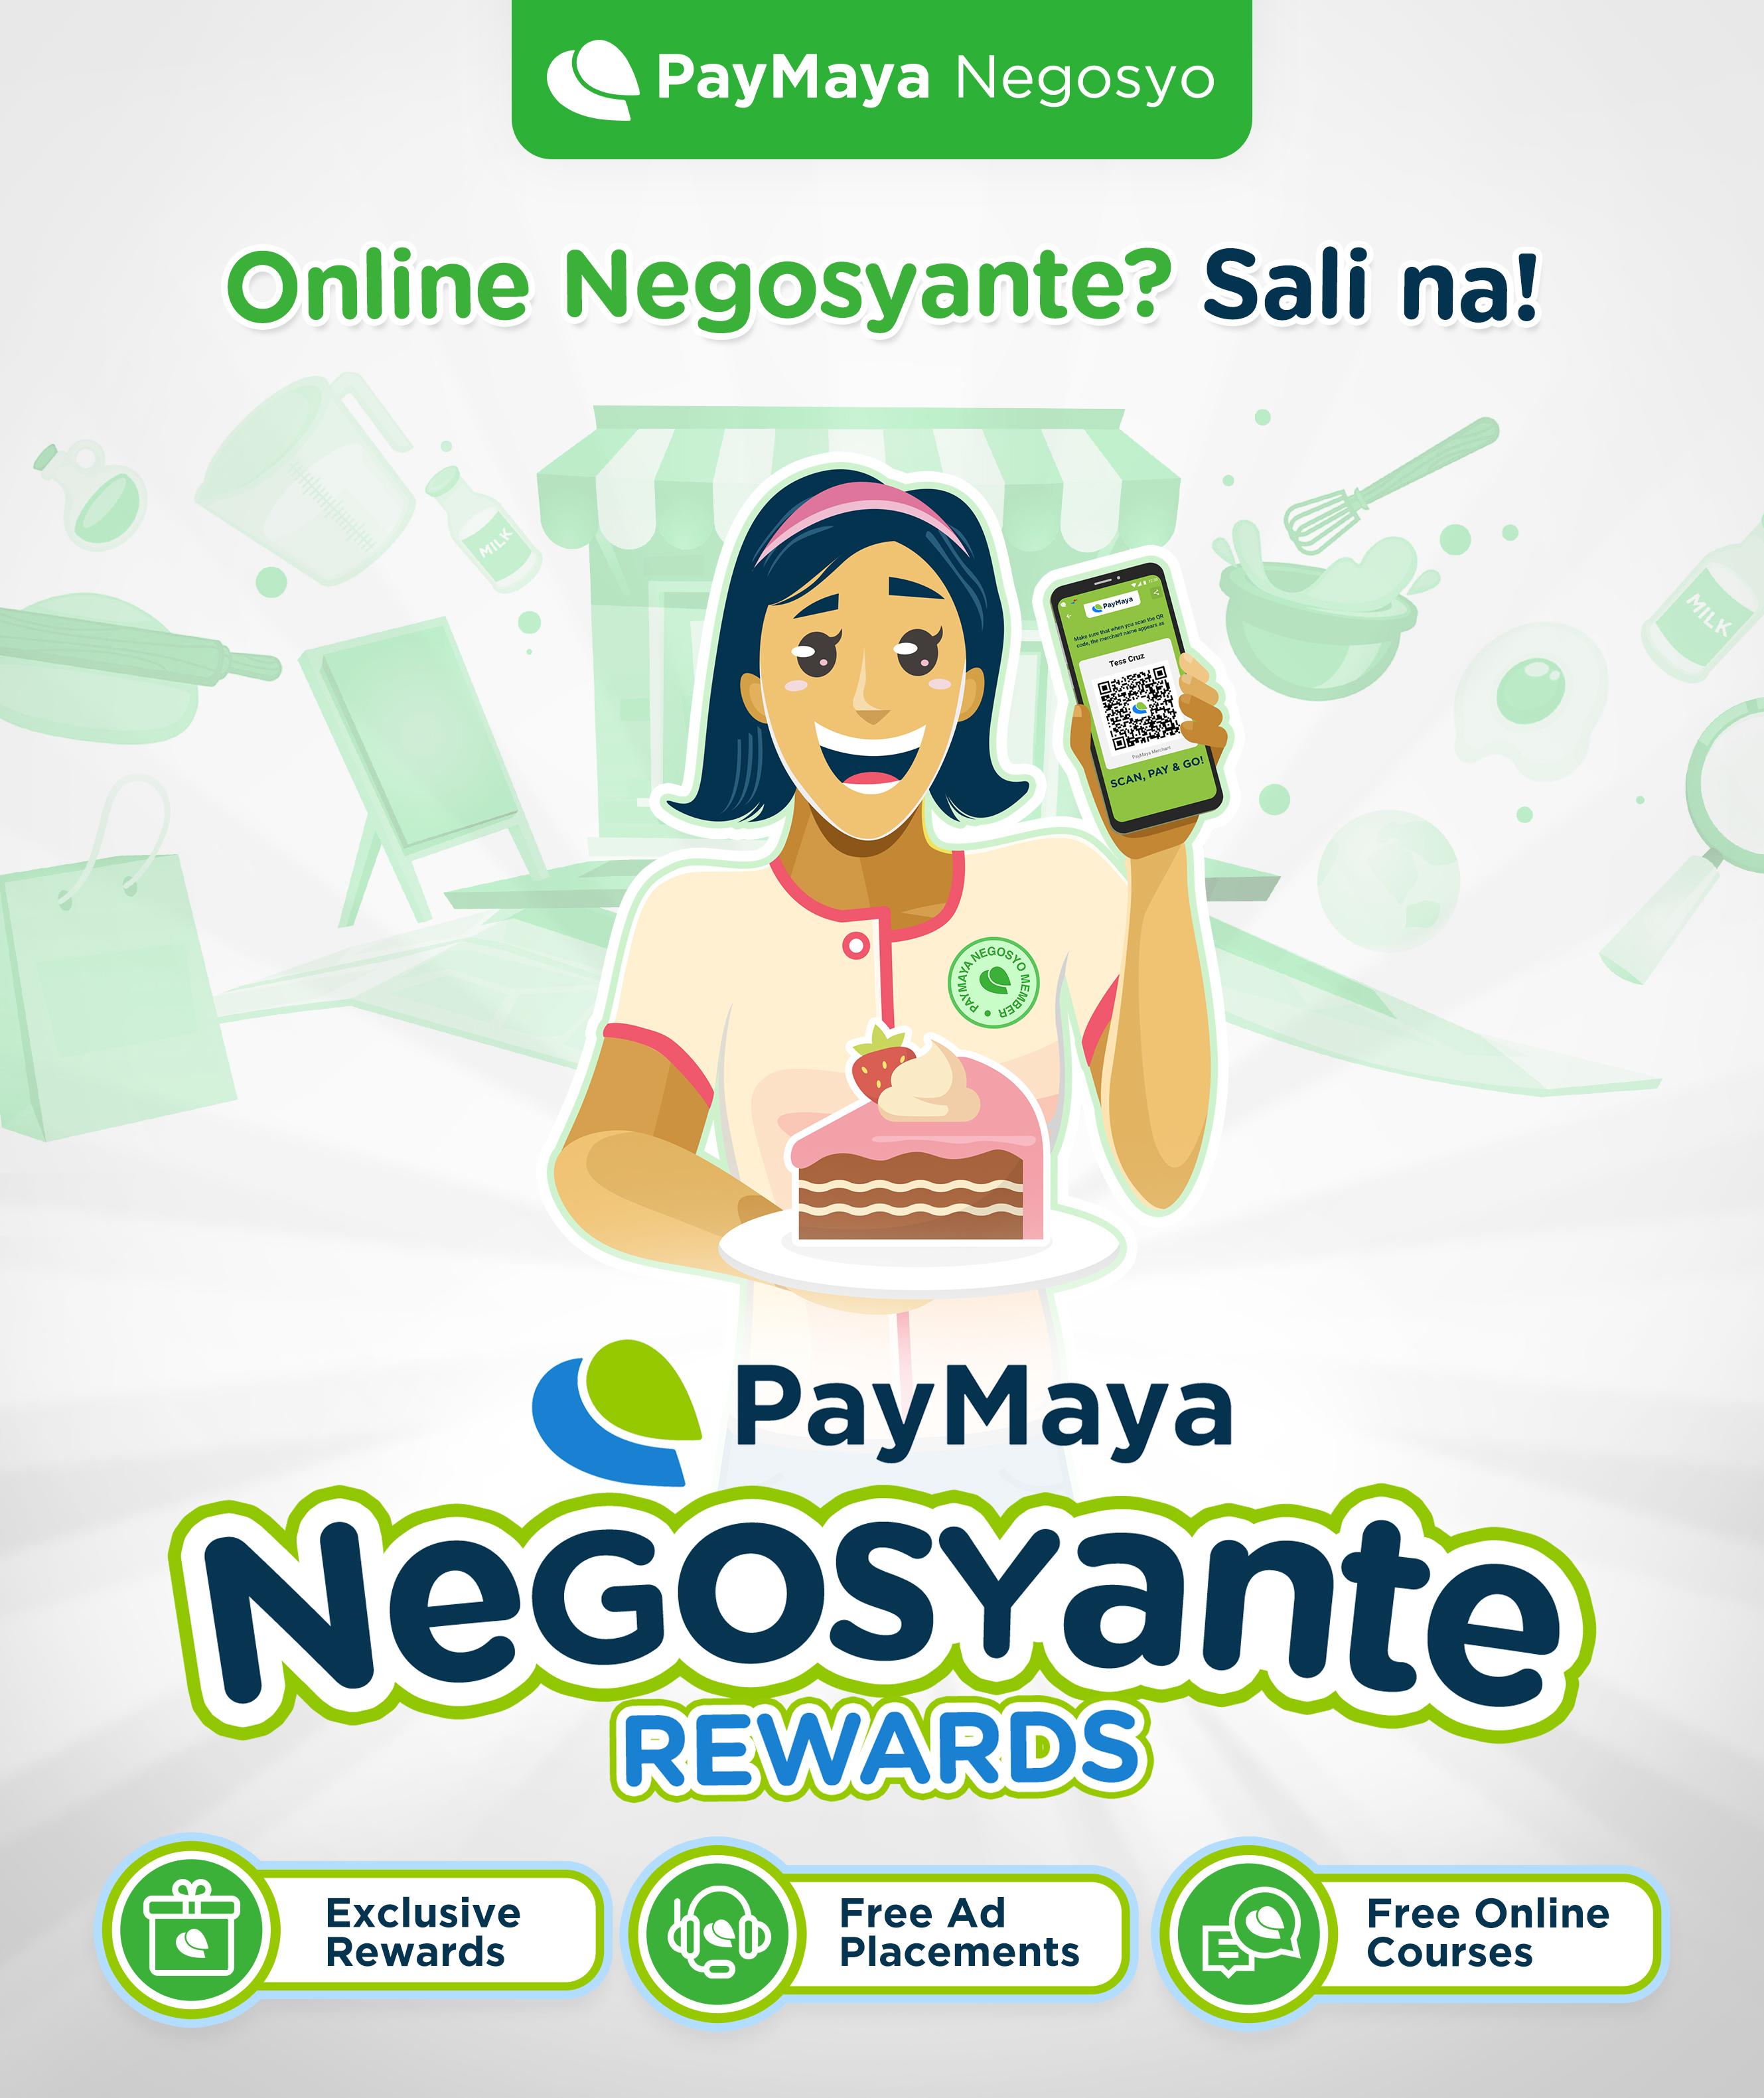 PAYMAYA_NEGOSYO_KV new logo 2